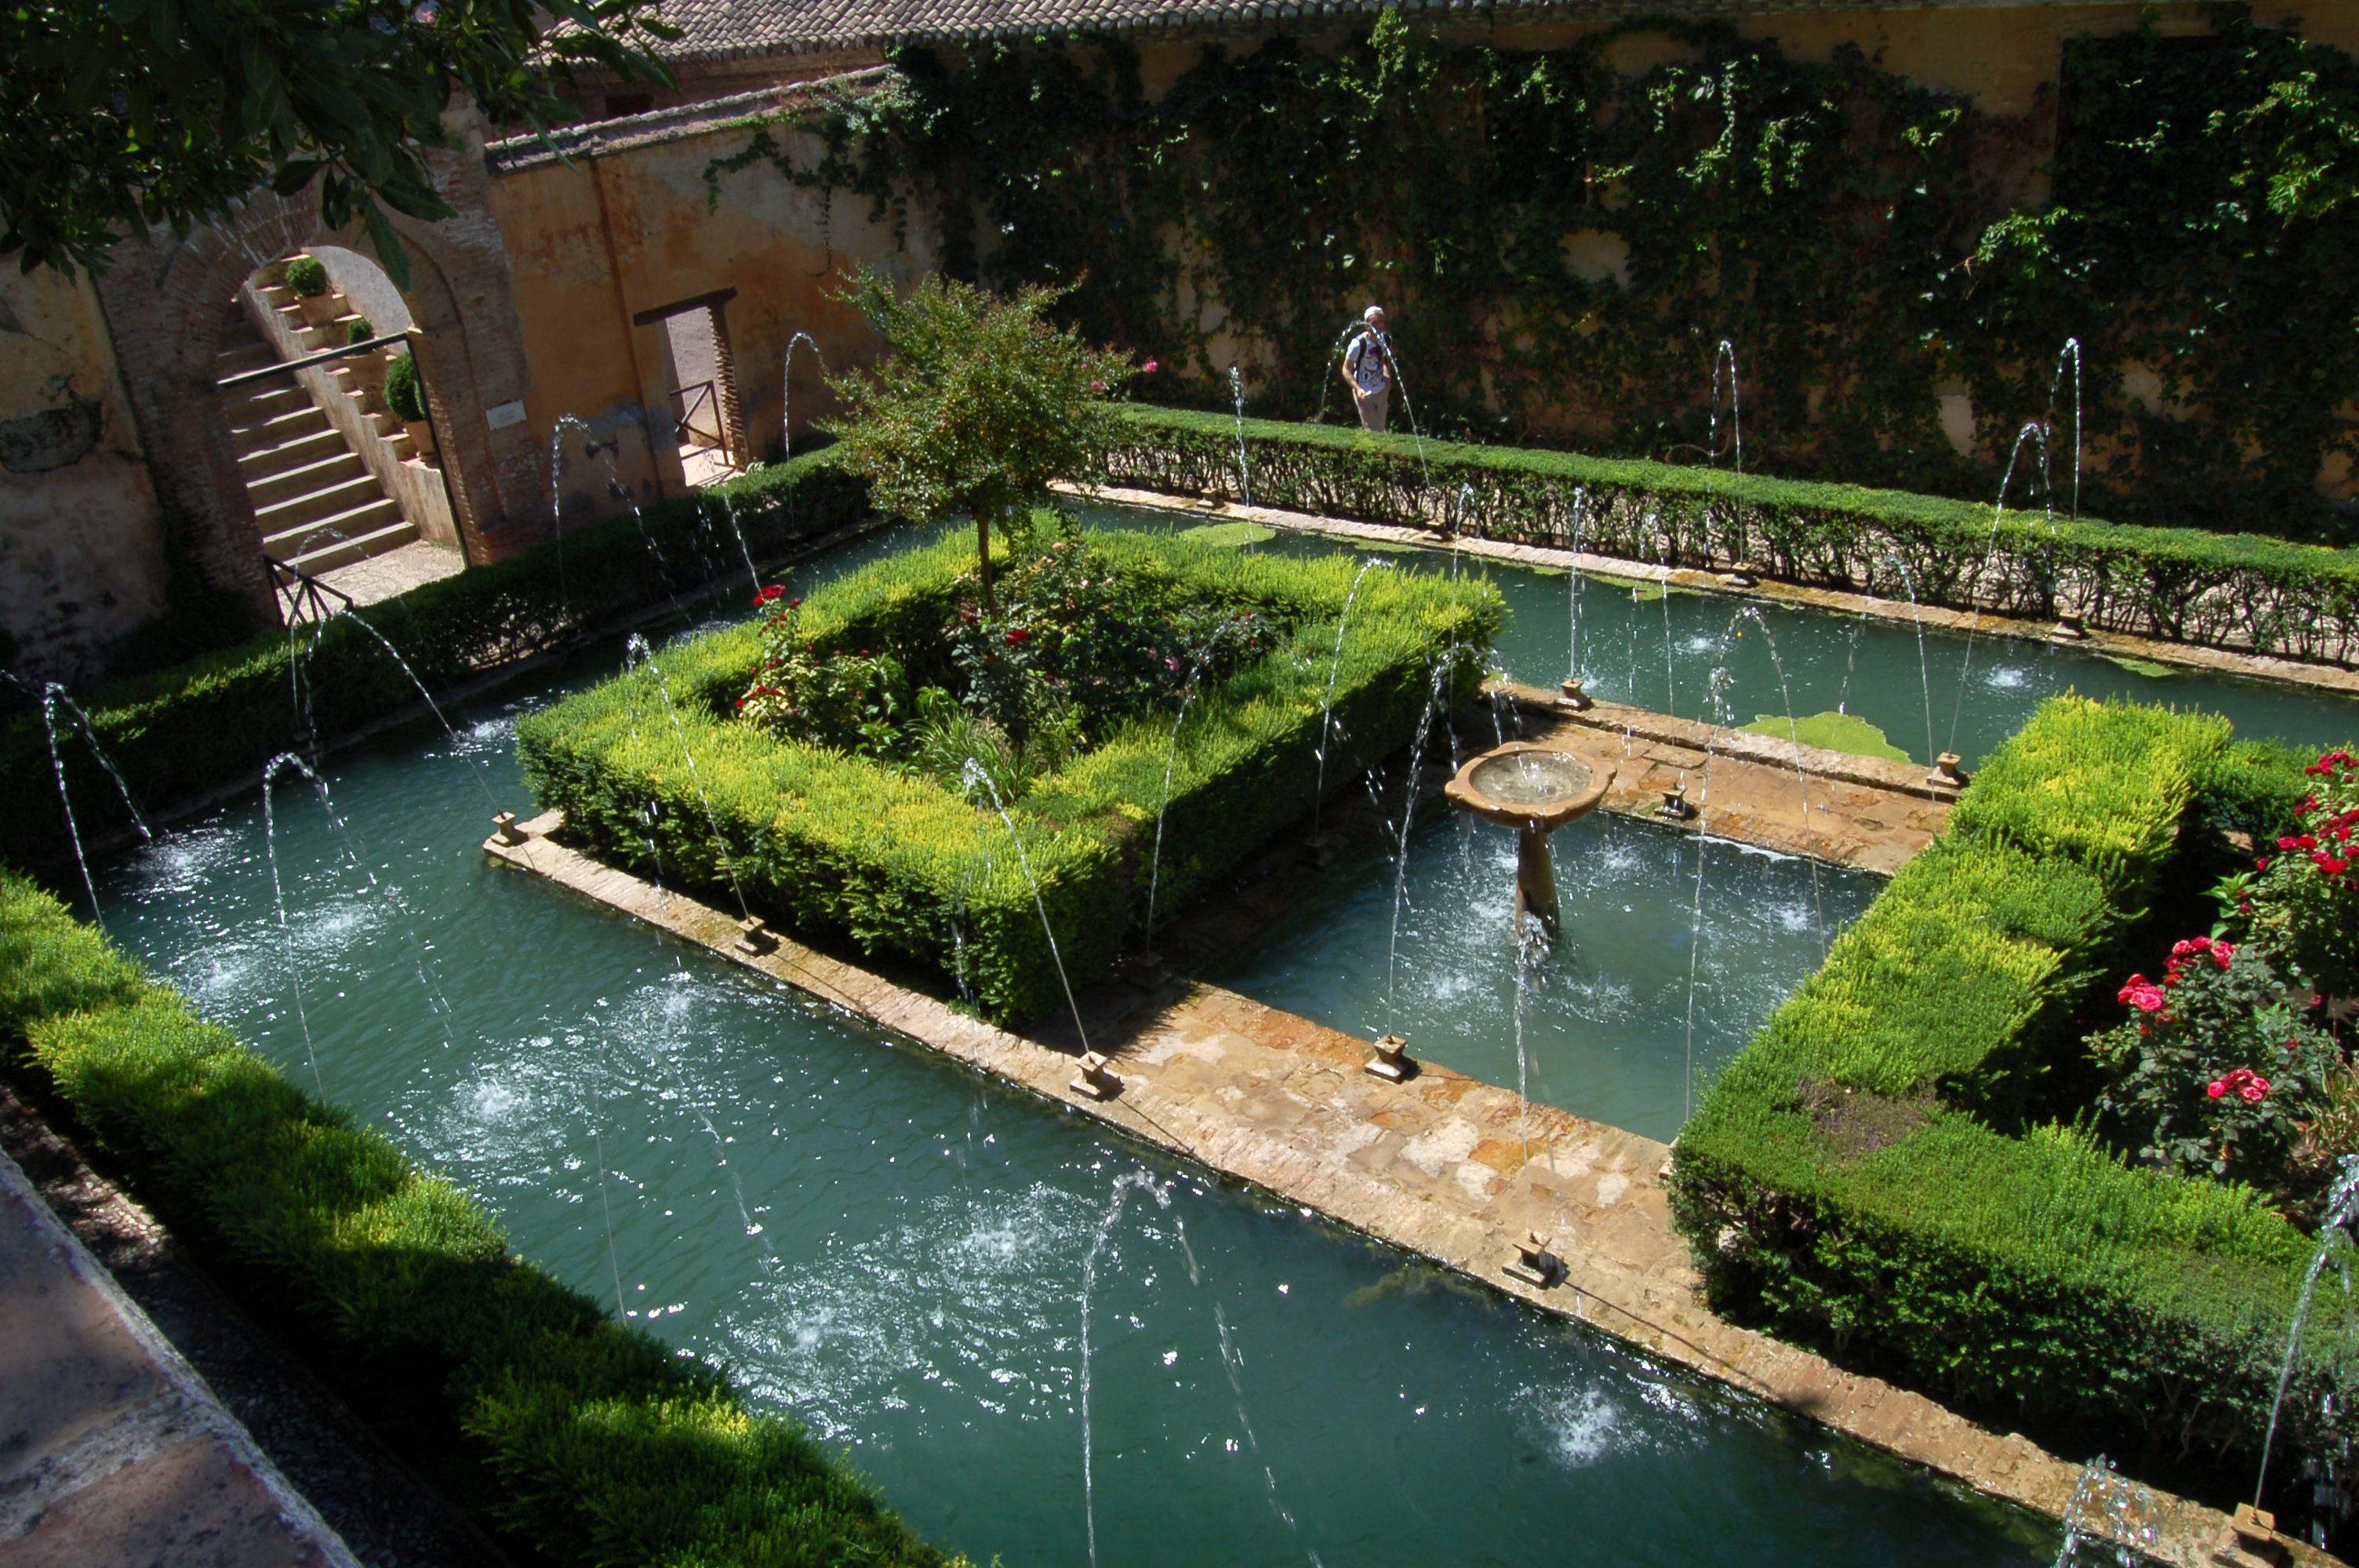 archivojardn alhambrajpg - Jardin De L Alhambra